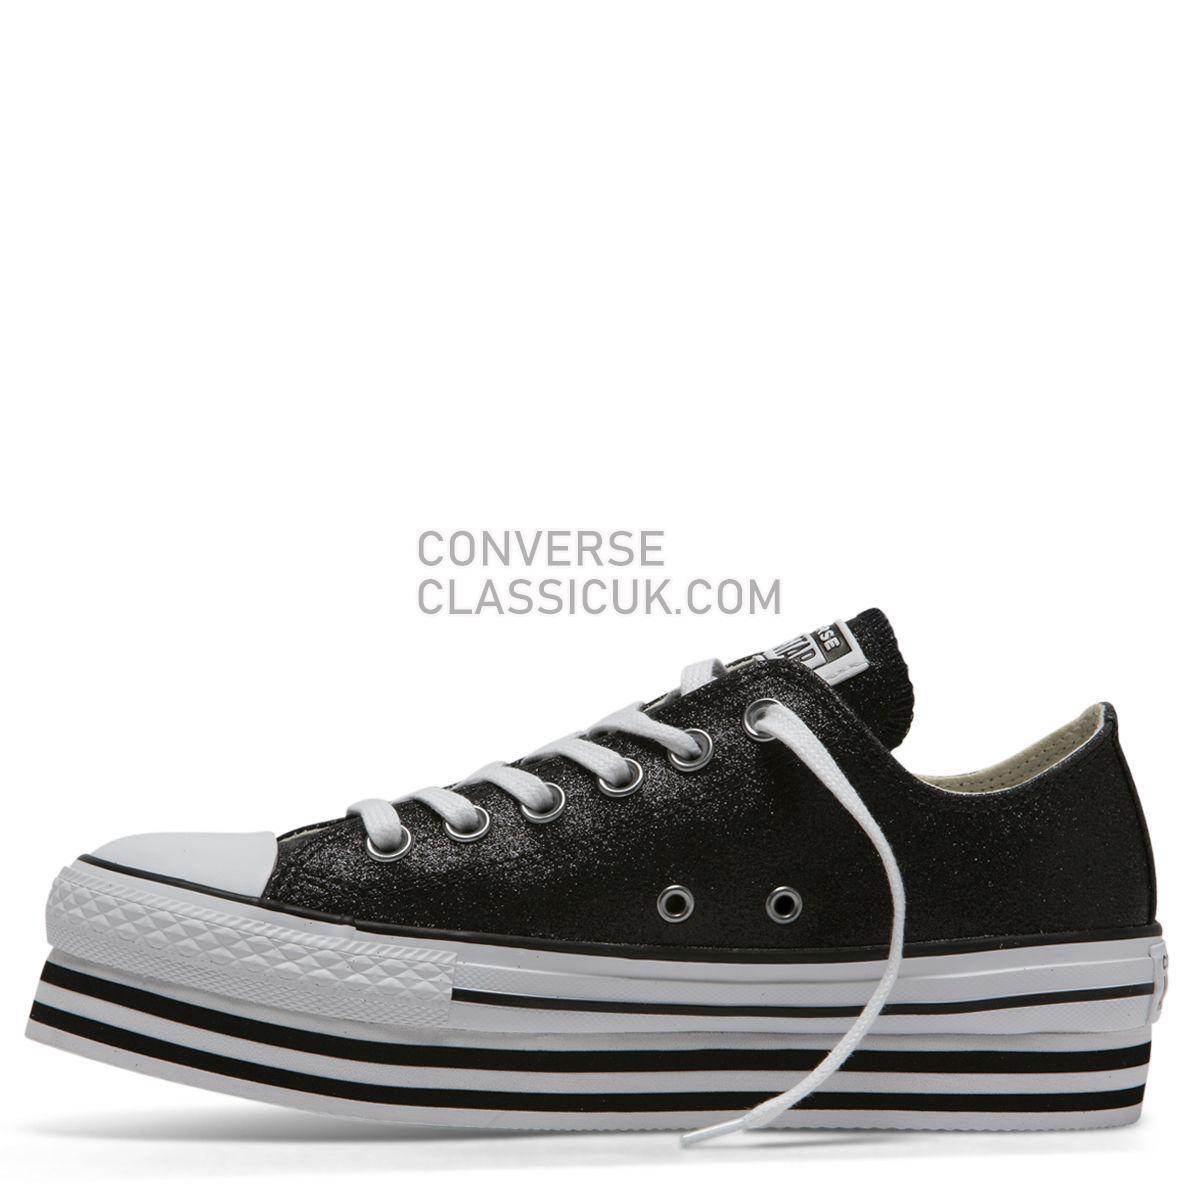 Converse Chuck Taylor All Star Shiny Metal Platform Low Top Black Womens 564877 Black/Black/White Shoes